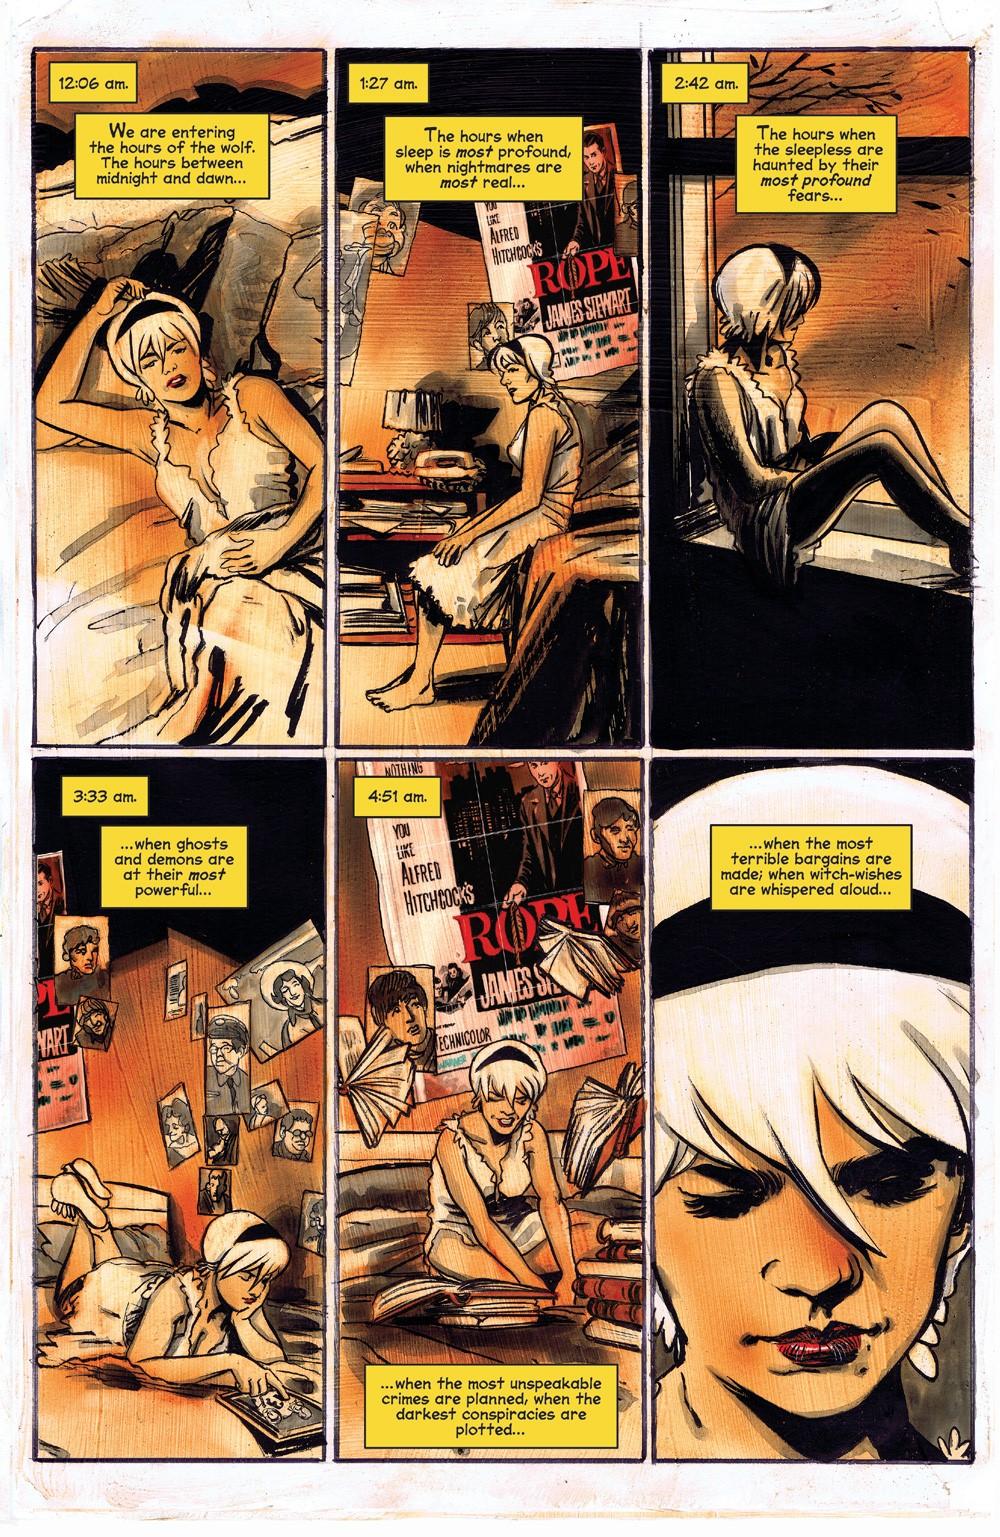 ChillingAdventuresOfSabrina_09-01 ComicList Previews: CHILLING ADVENTURES OF SABRINA #9